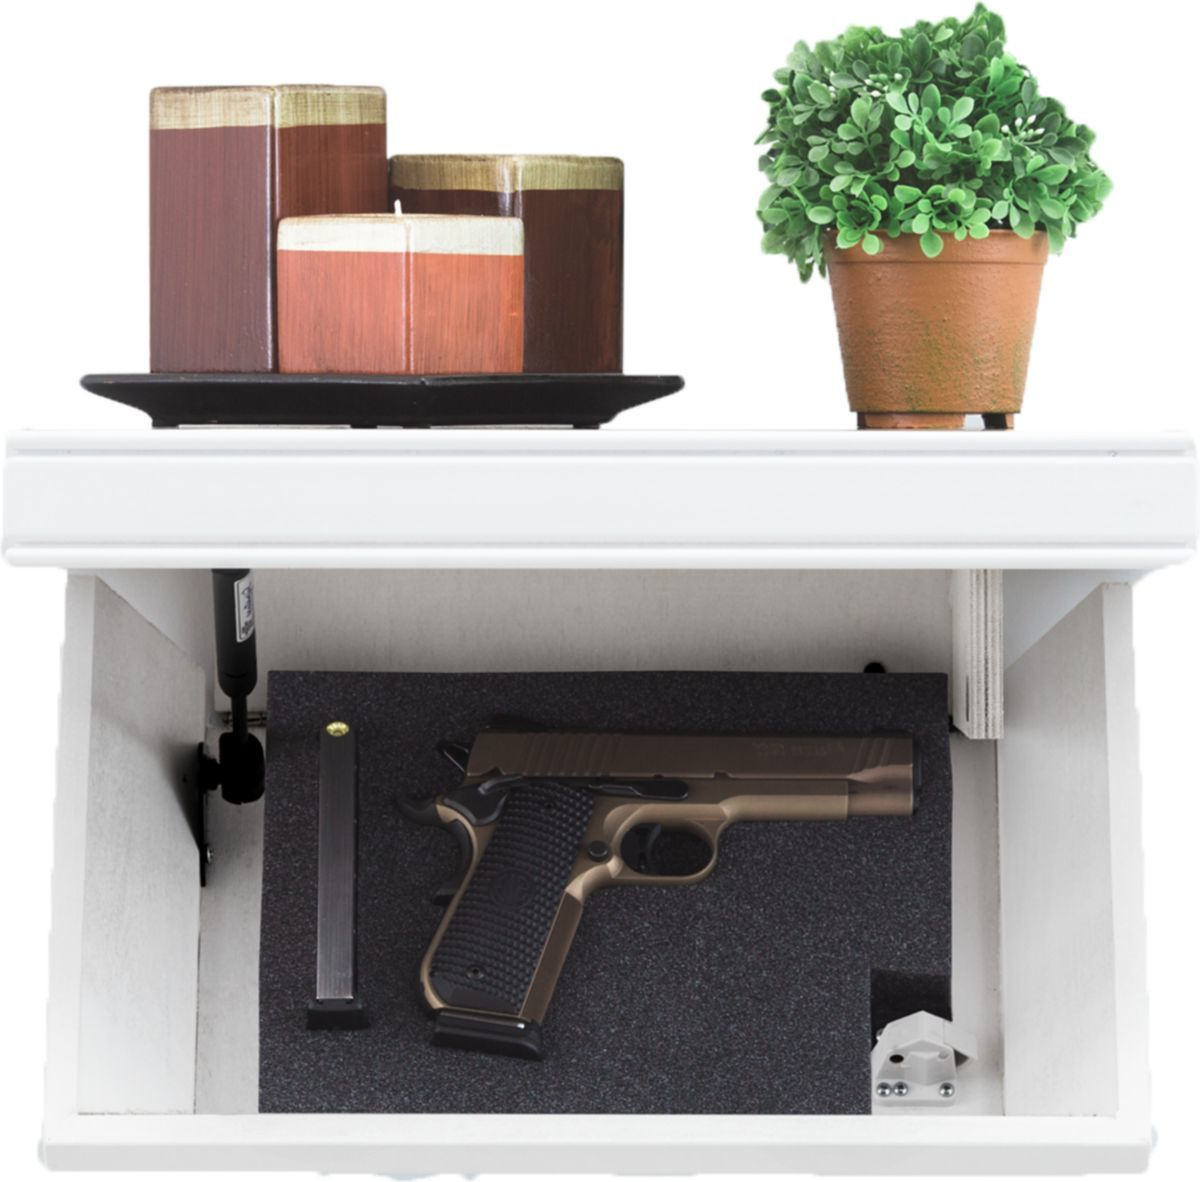 Tactical Walls 812 Pistol-Length White Shelf – Magnetic Lock